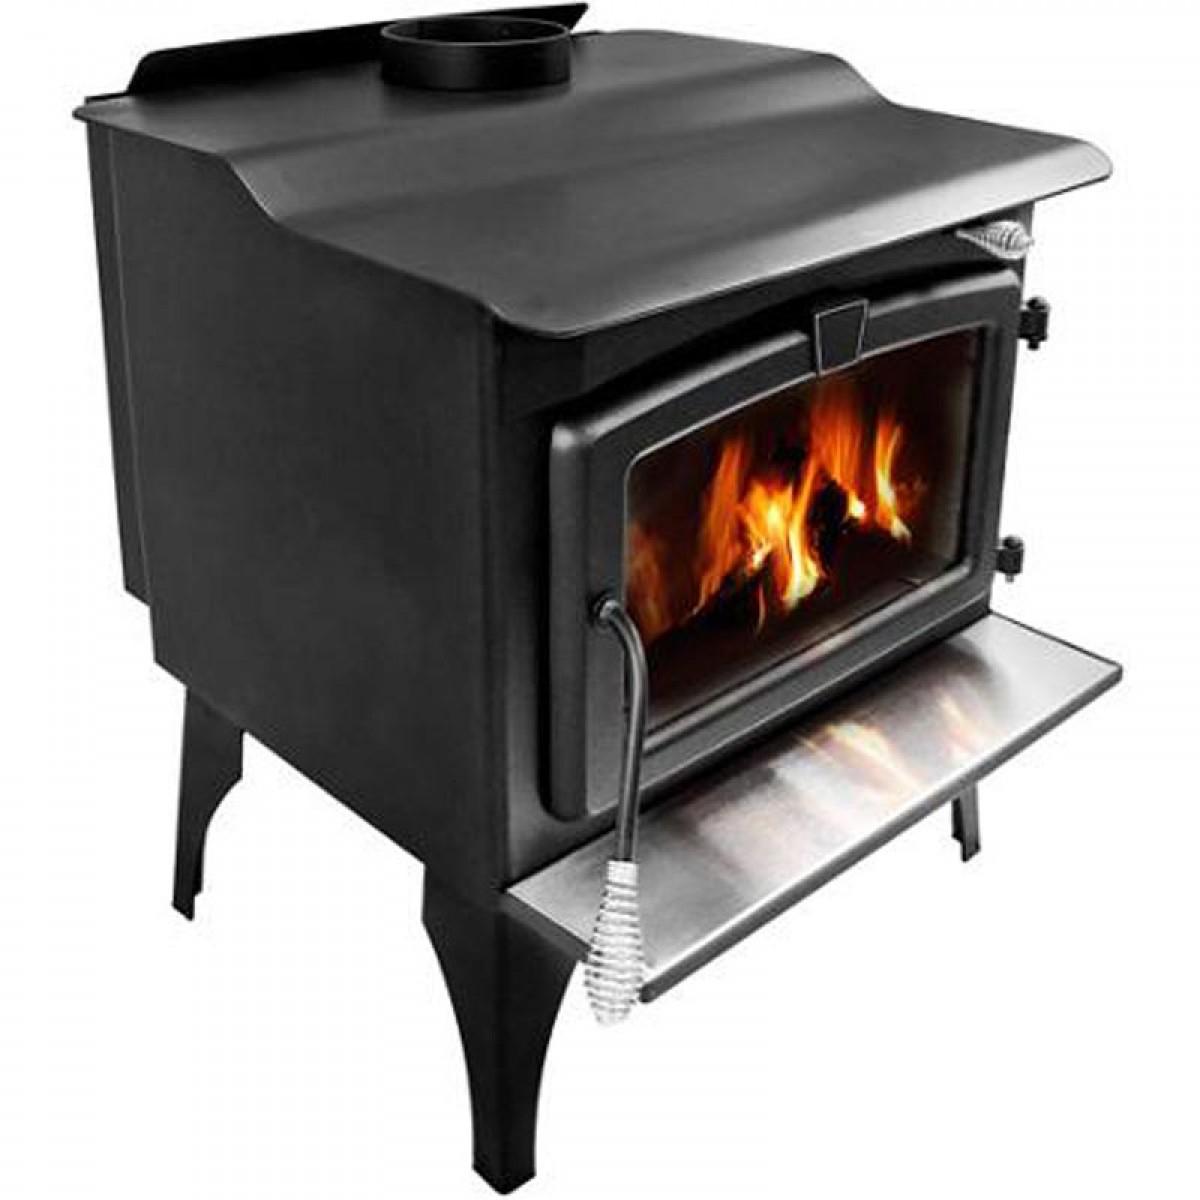 Pleasant Hearth: Pleasant Hearth Medium Wood Burning Stove With Legs LWS-12720